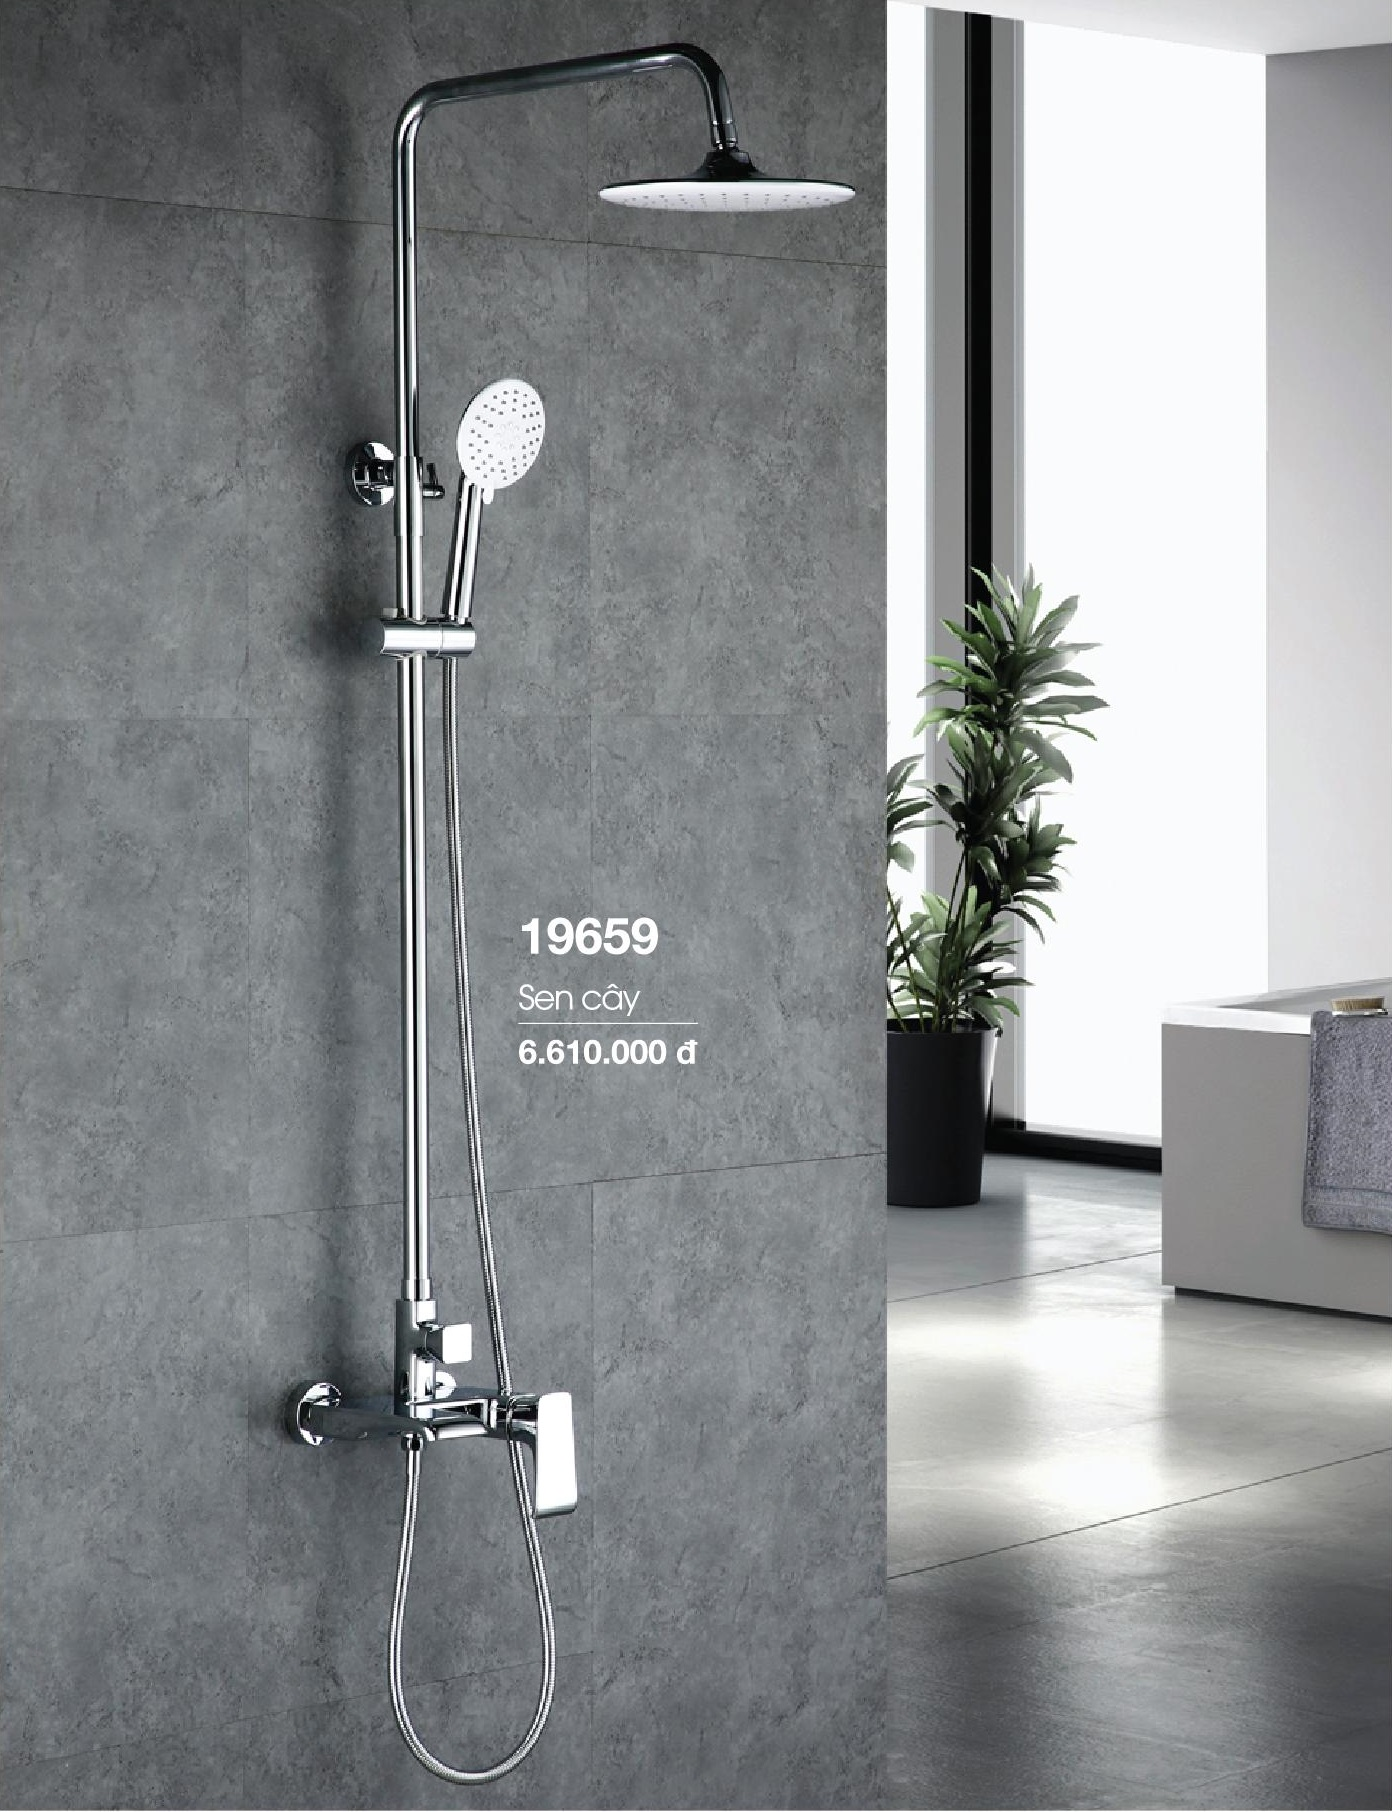 G19659 Bộ sen cây tắm